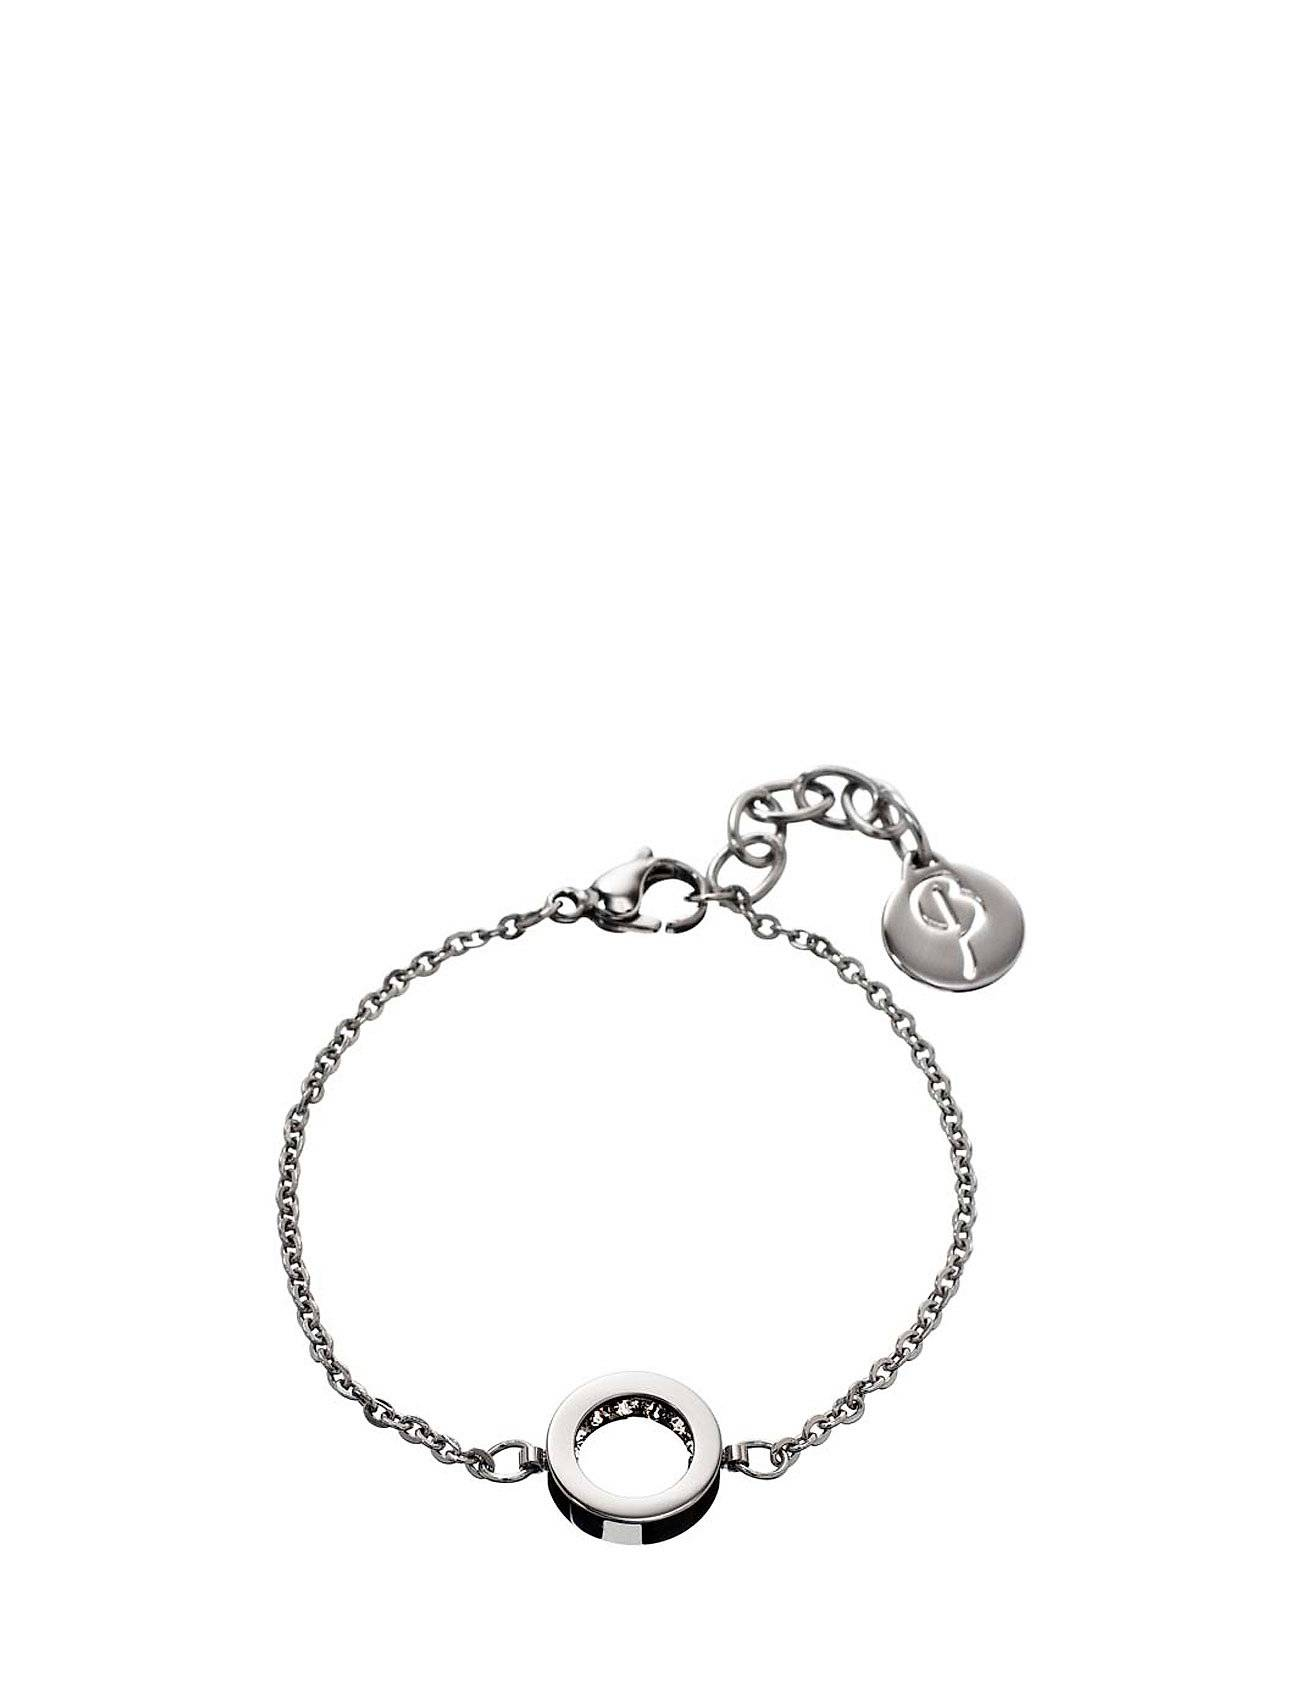 Edblad Monaco Bracelet Thin Accessories Jewellery Bracelets Chain Bracelets Hopea Edblad